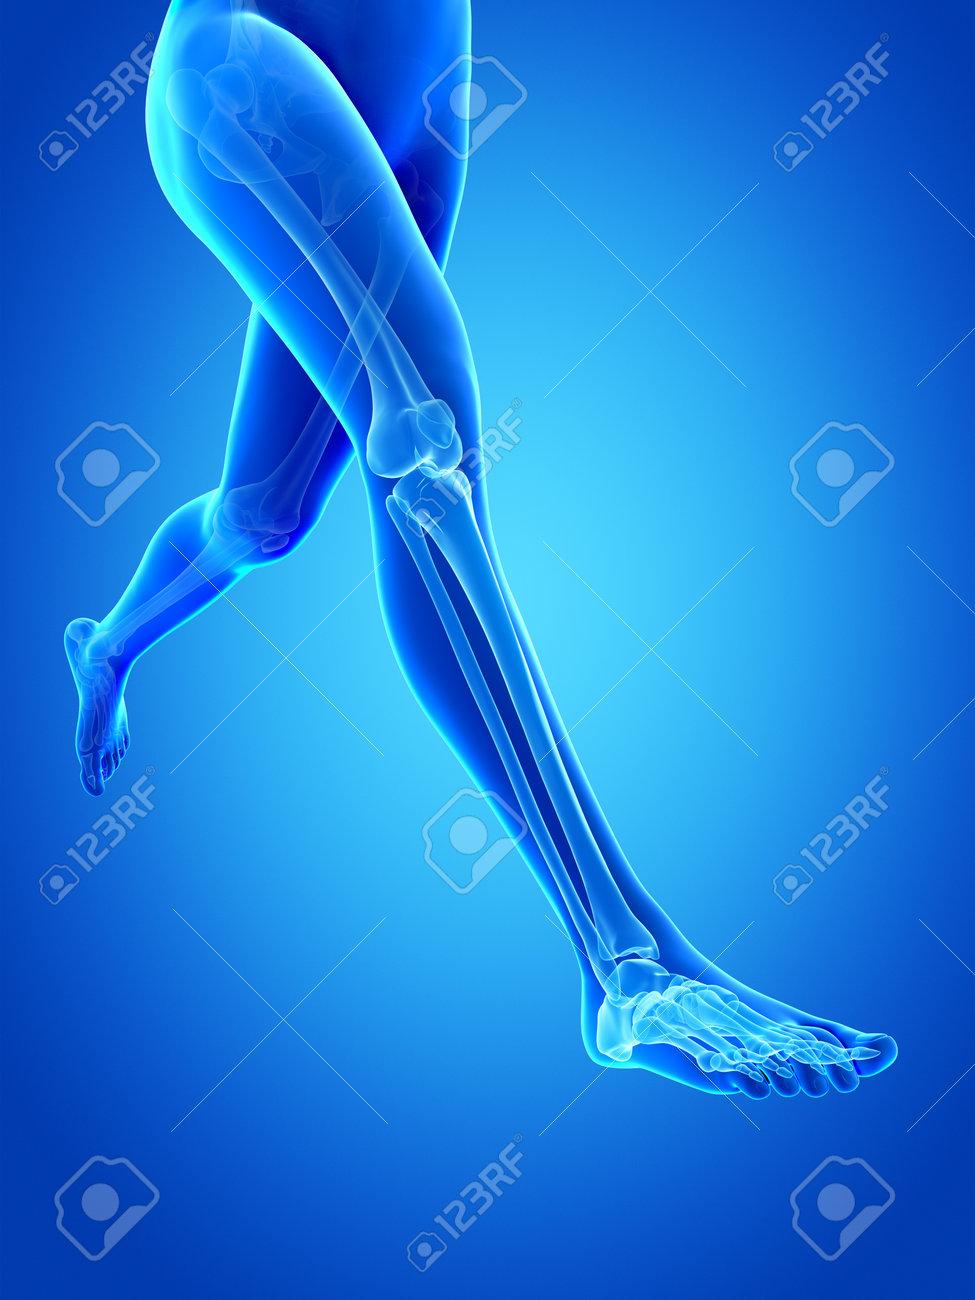 Woman Running Visible Anatomy Of The Leg Bones Stock Photo